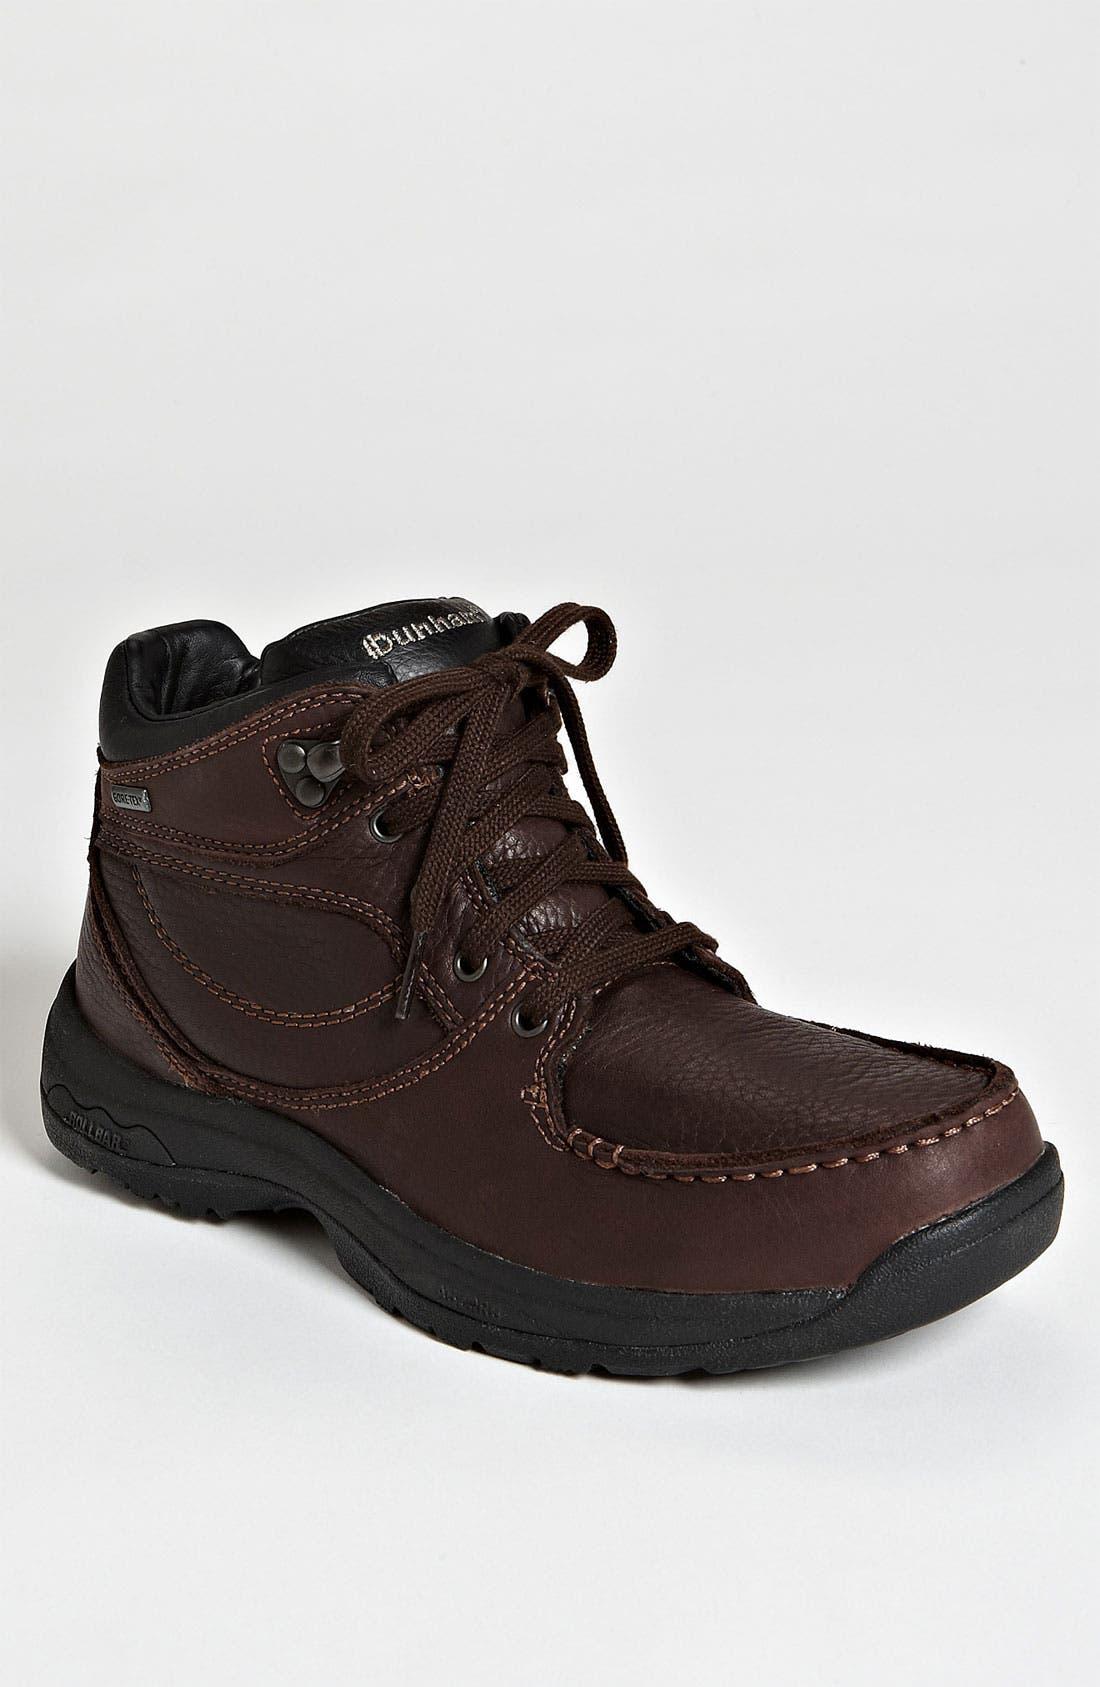 Main Image - Dunham 'Incline' Boot